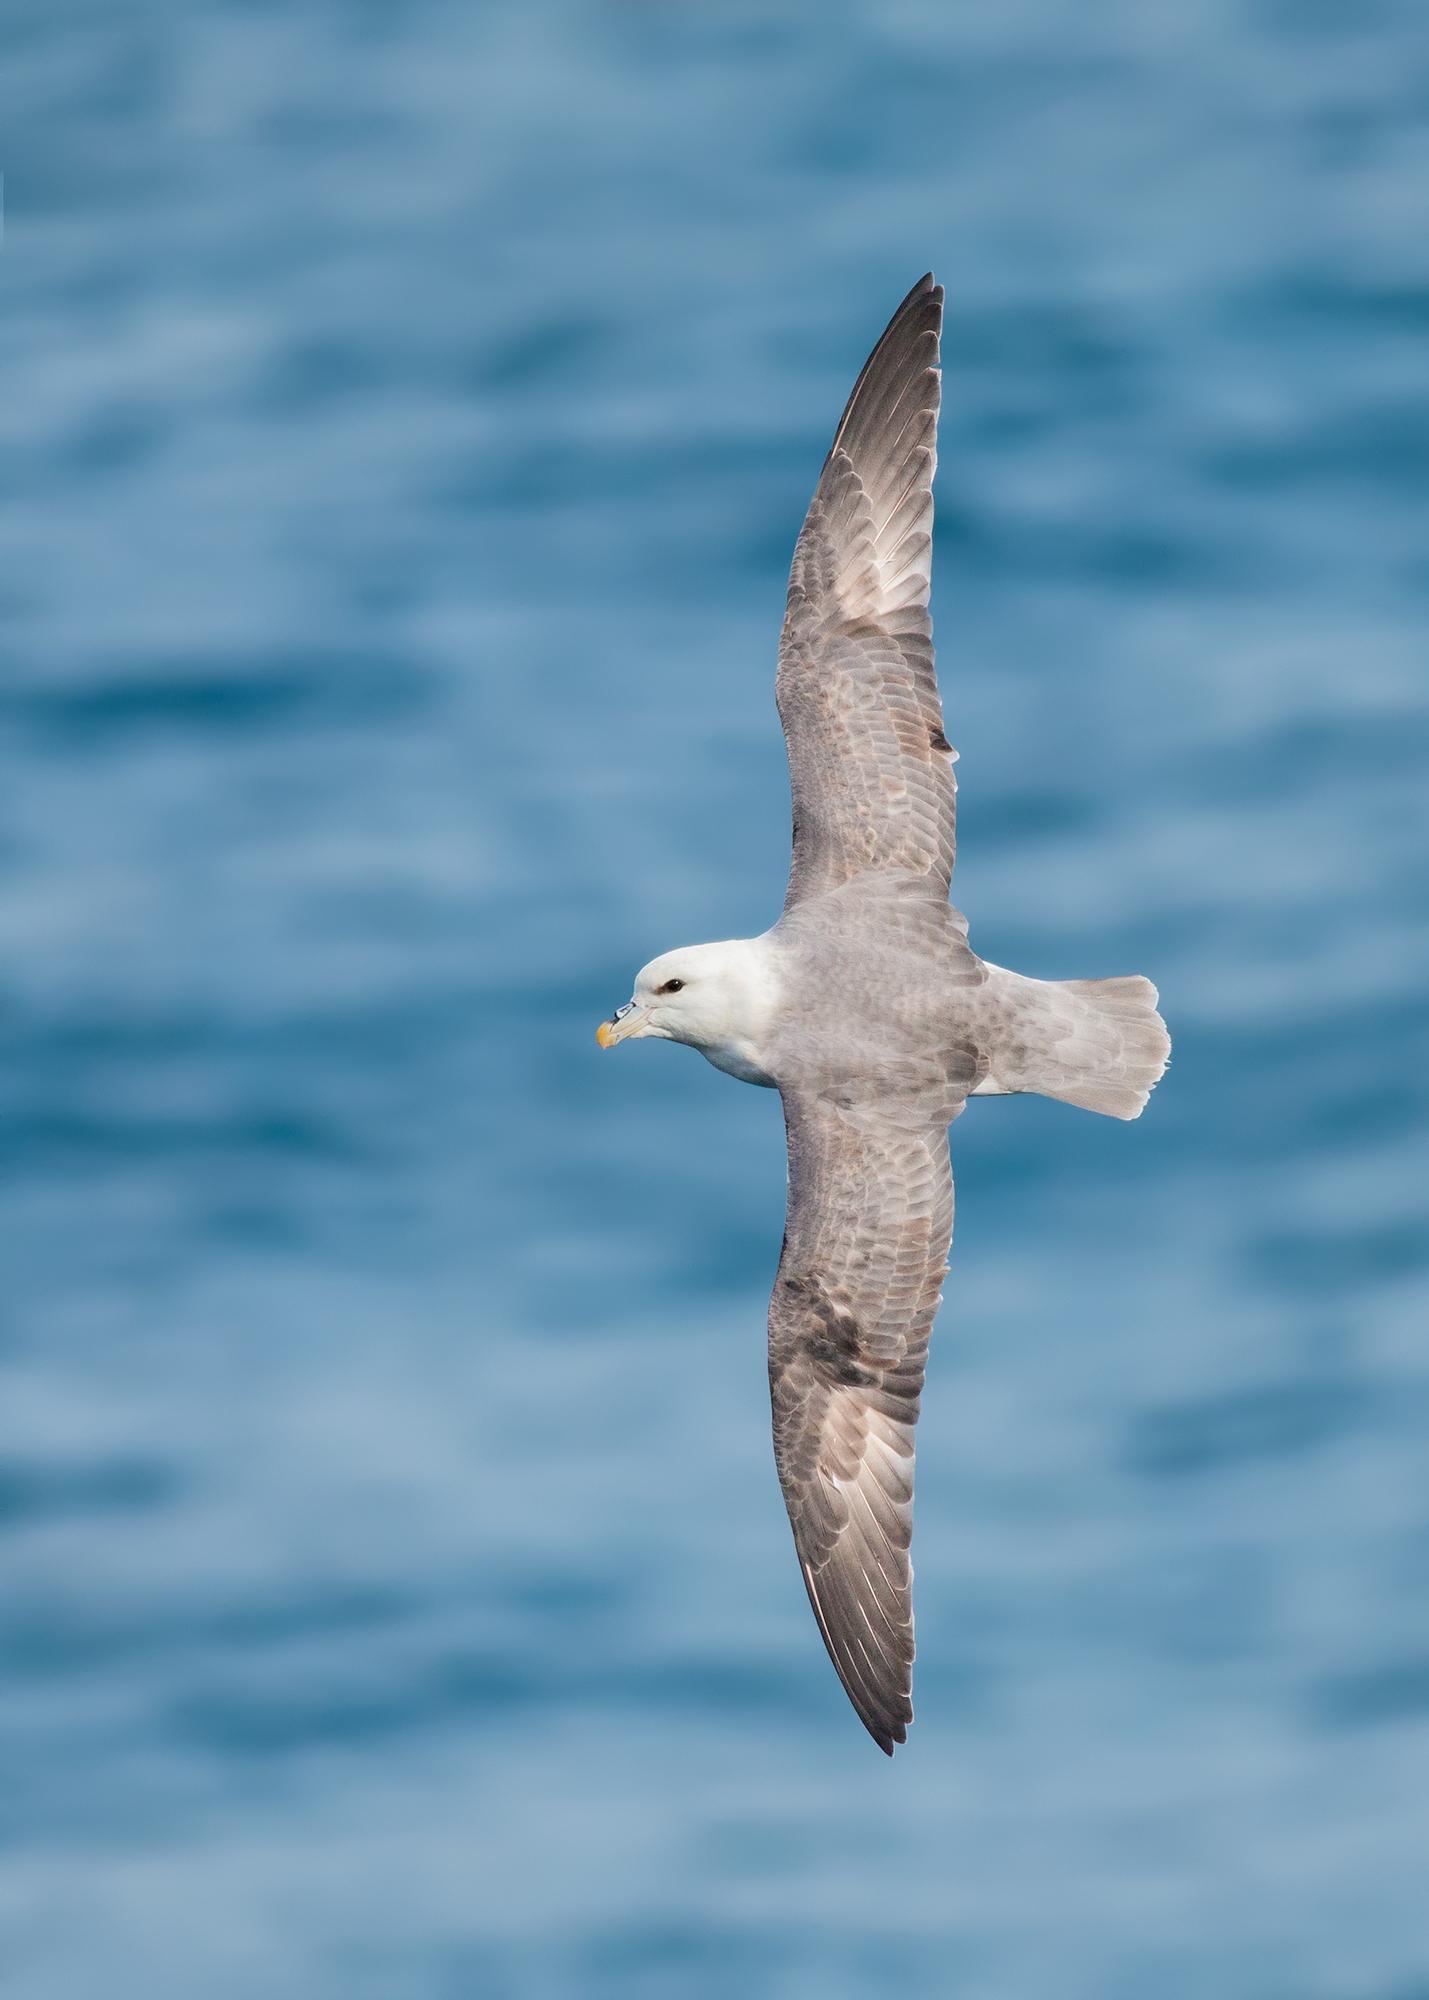 Stormfågel-JPEG_web 8.jpg